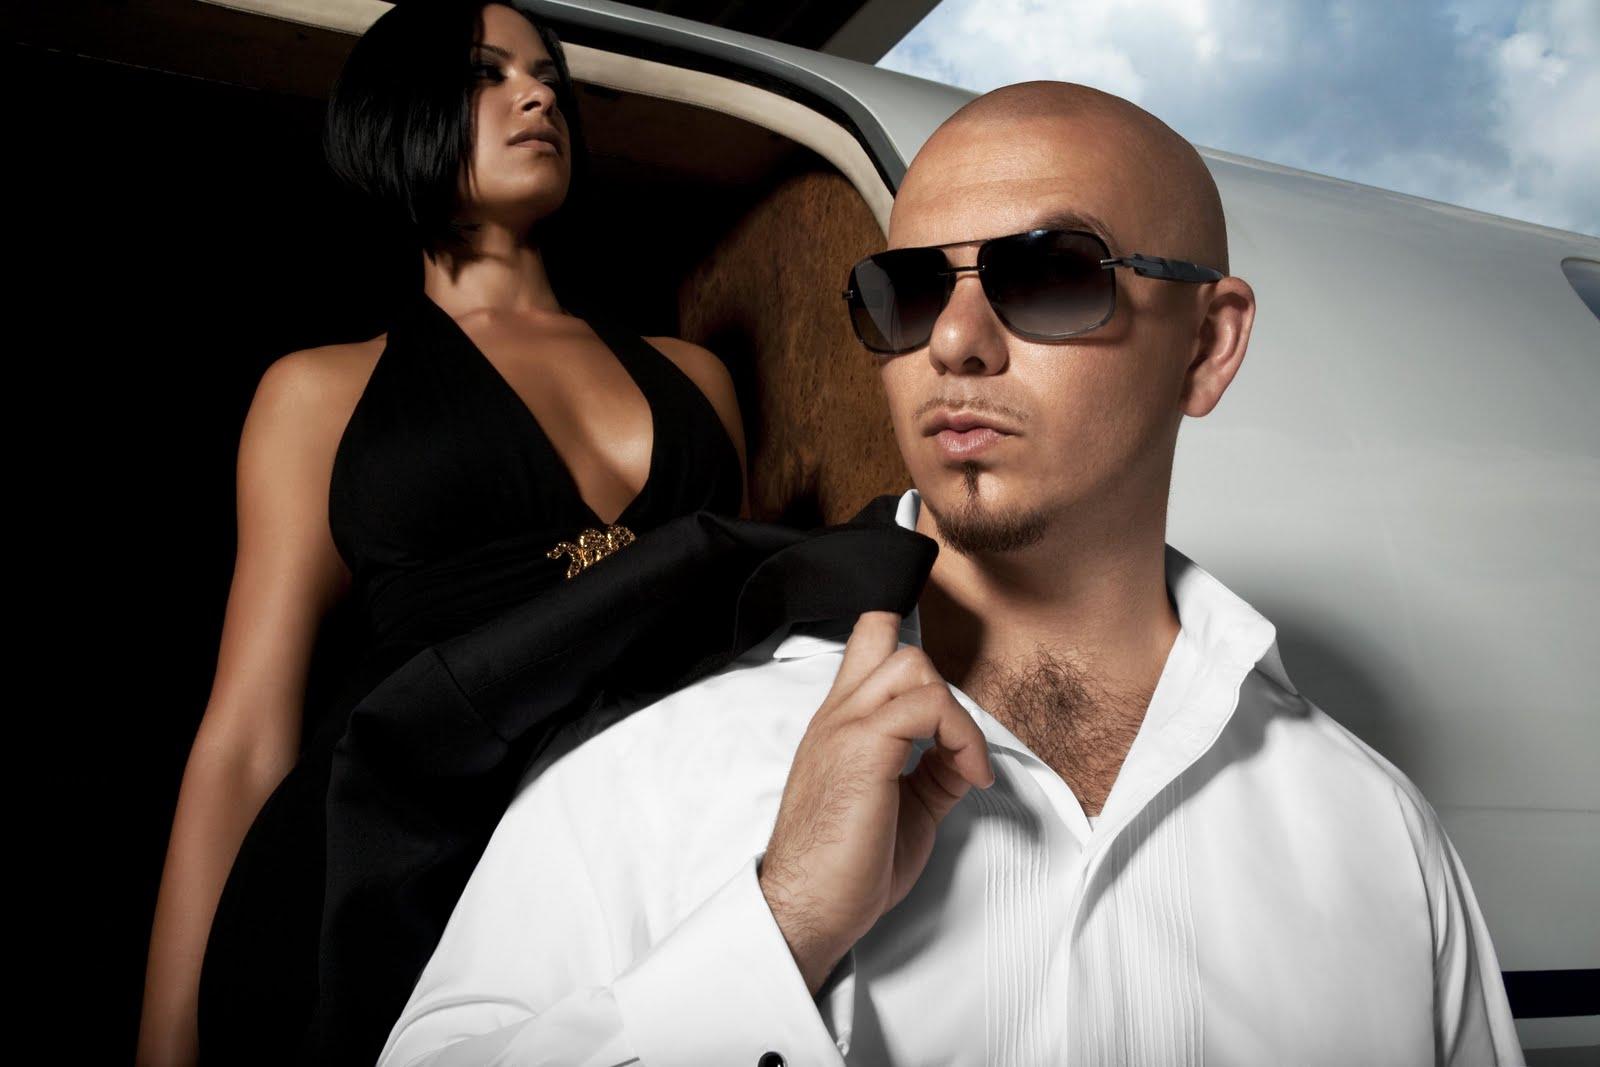 http://4.bp.blogspot.com/-ZKUdg-35hCw/Td0Jvw4goGI/AAAAAAAAAok/jmOsvDAyvig/s1600/pitbull+-+rebelution.jpg